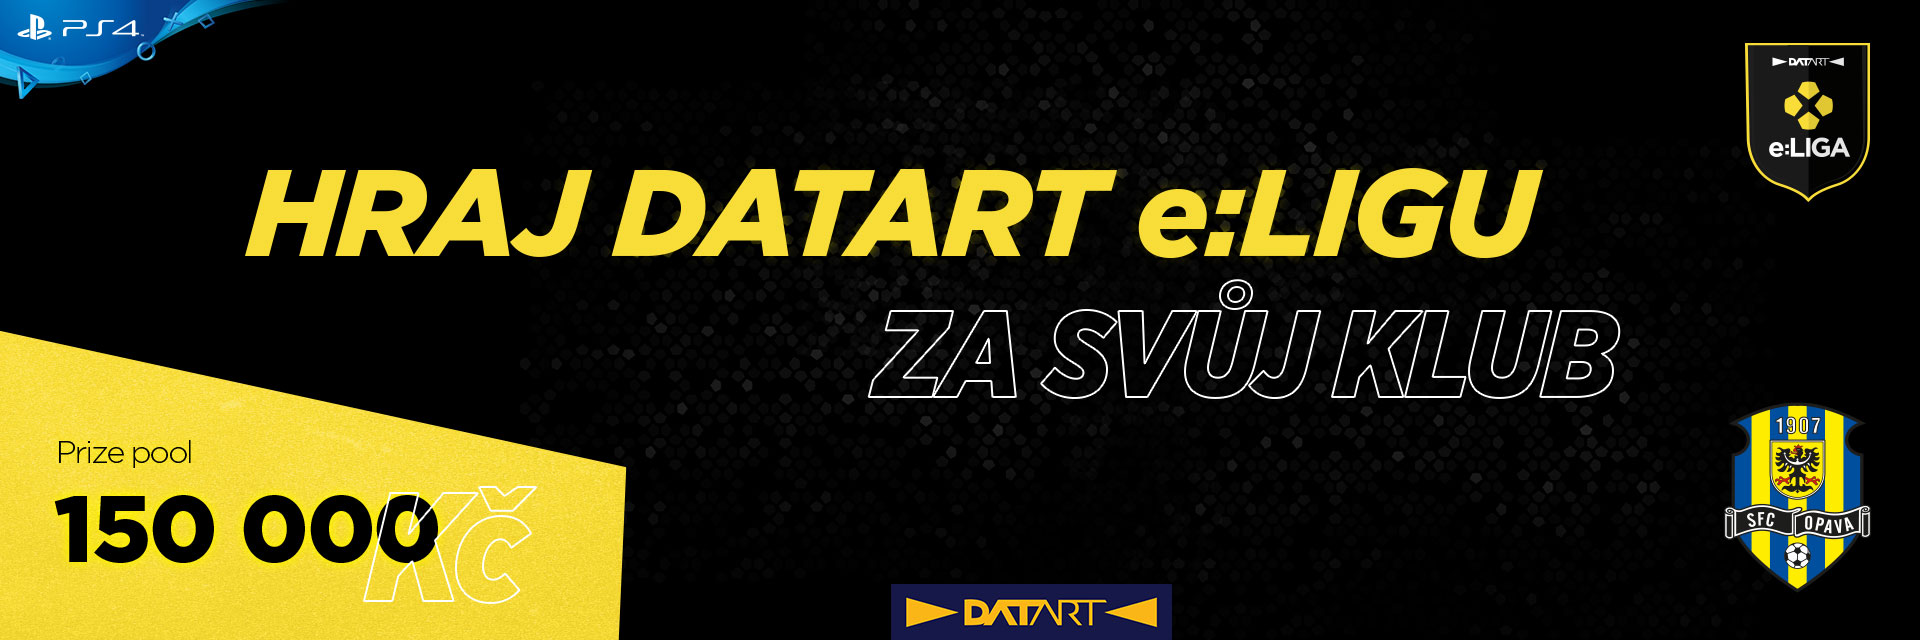 datart-e-liga-semifinale-slezsky-fc-opava